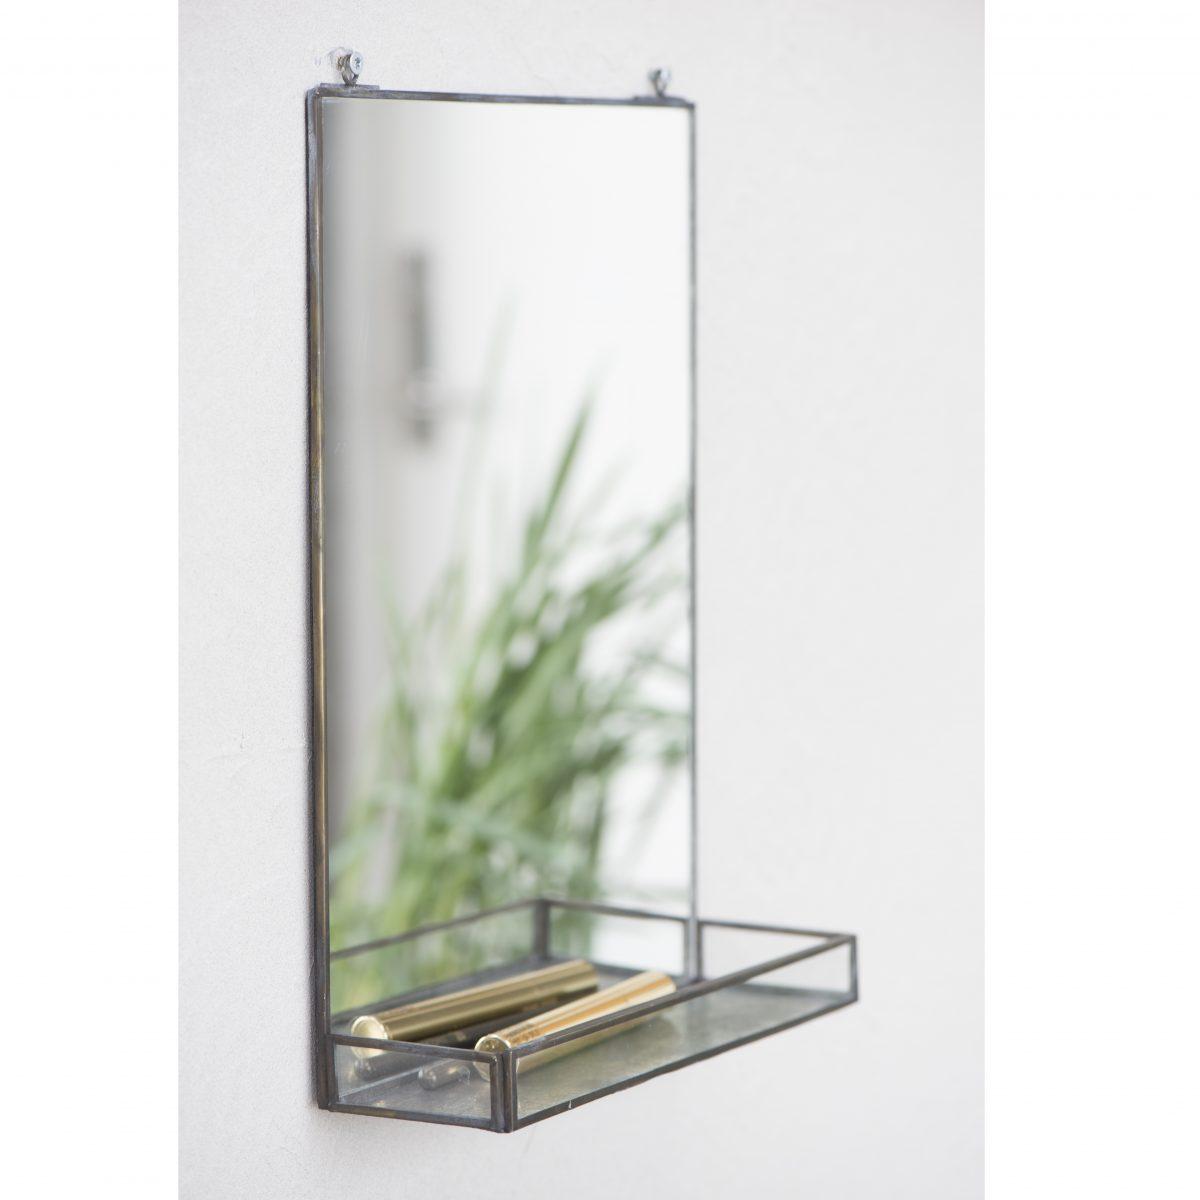 Medium Black Wall Hanging Mirror With Mini Shelf By Ib Laursen